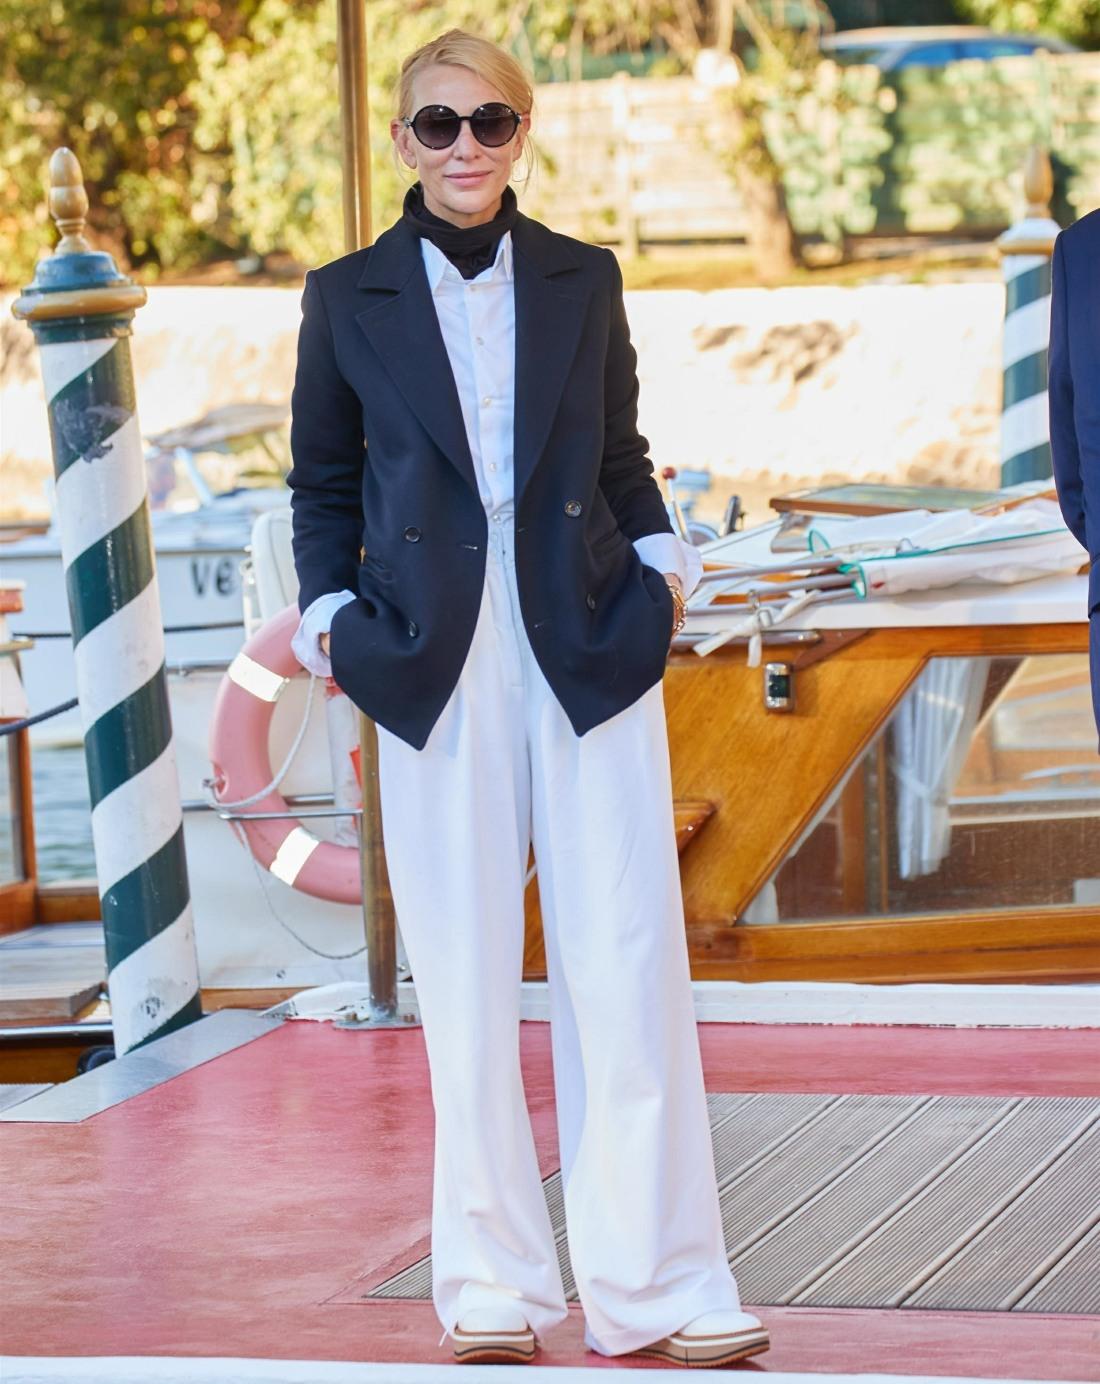 Cate Blanchett looks great as she arrives in Venice for the Venice Film Festival